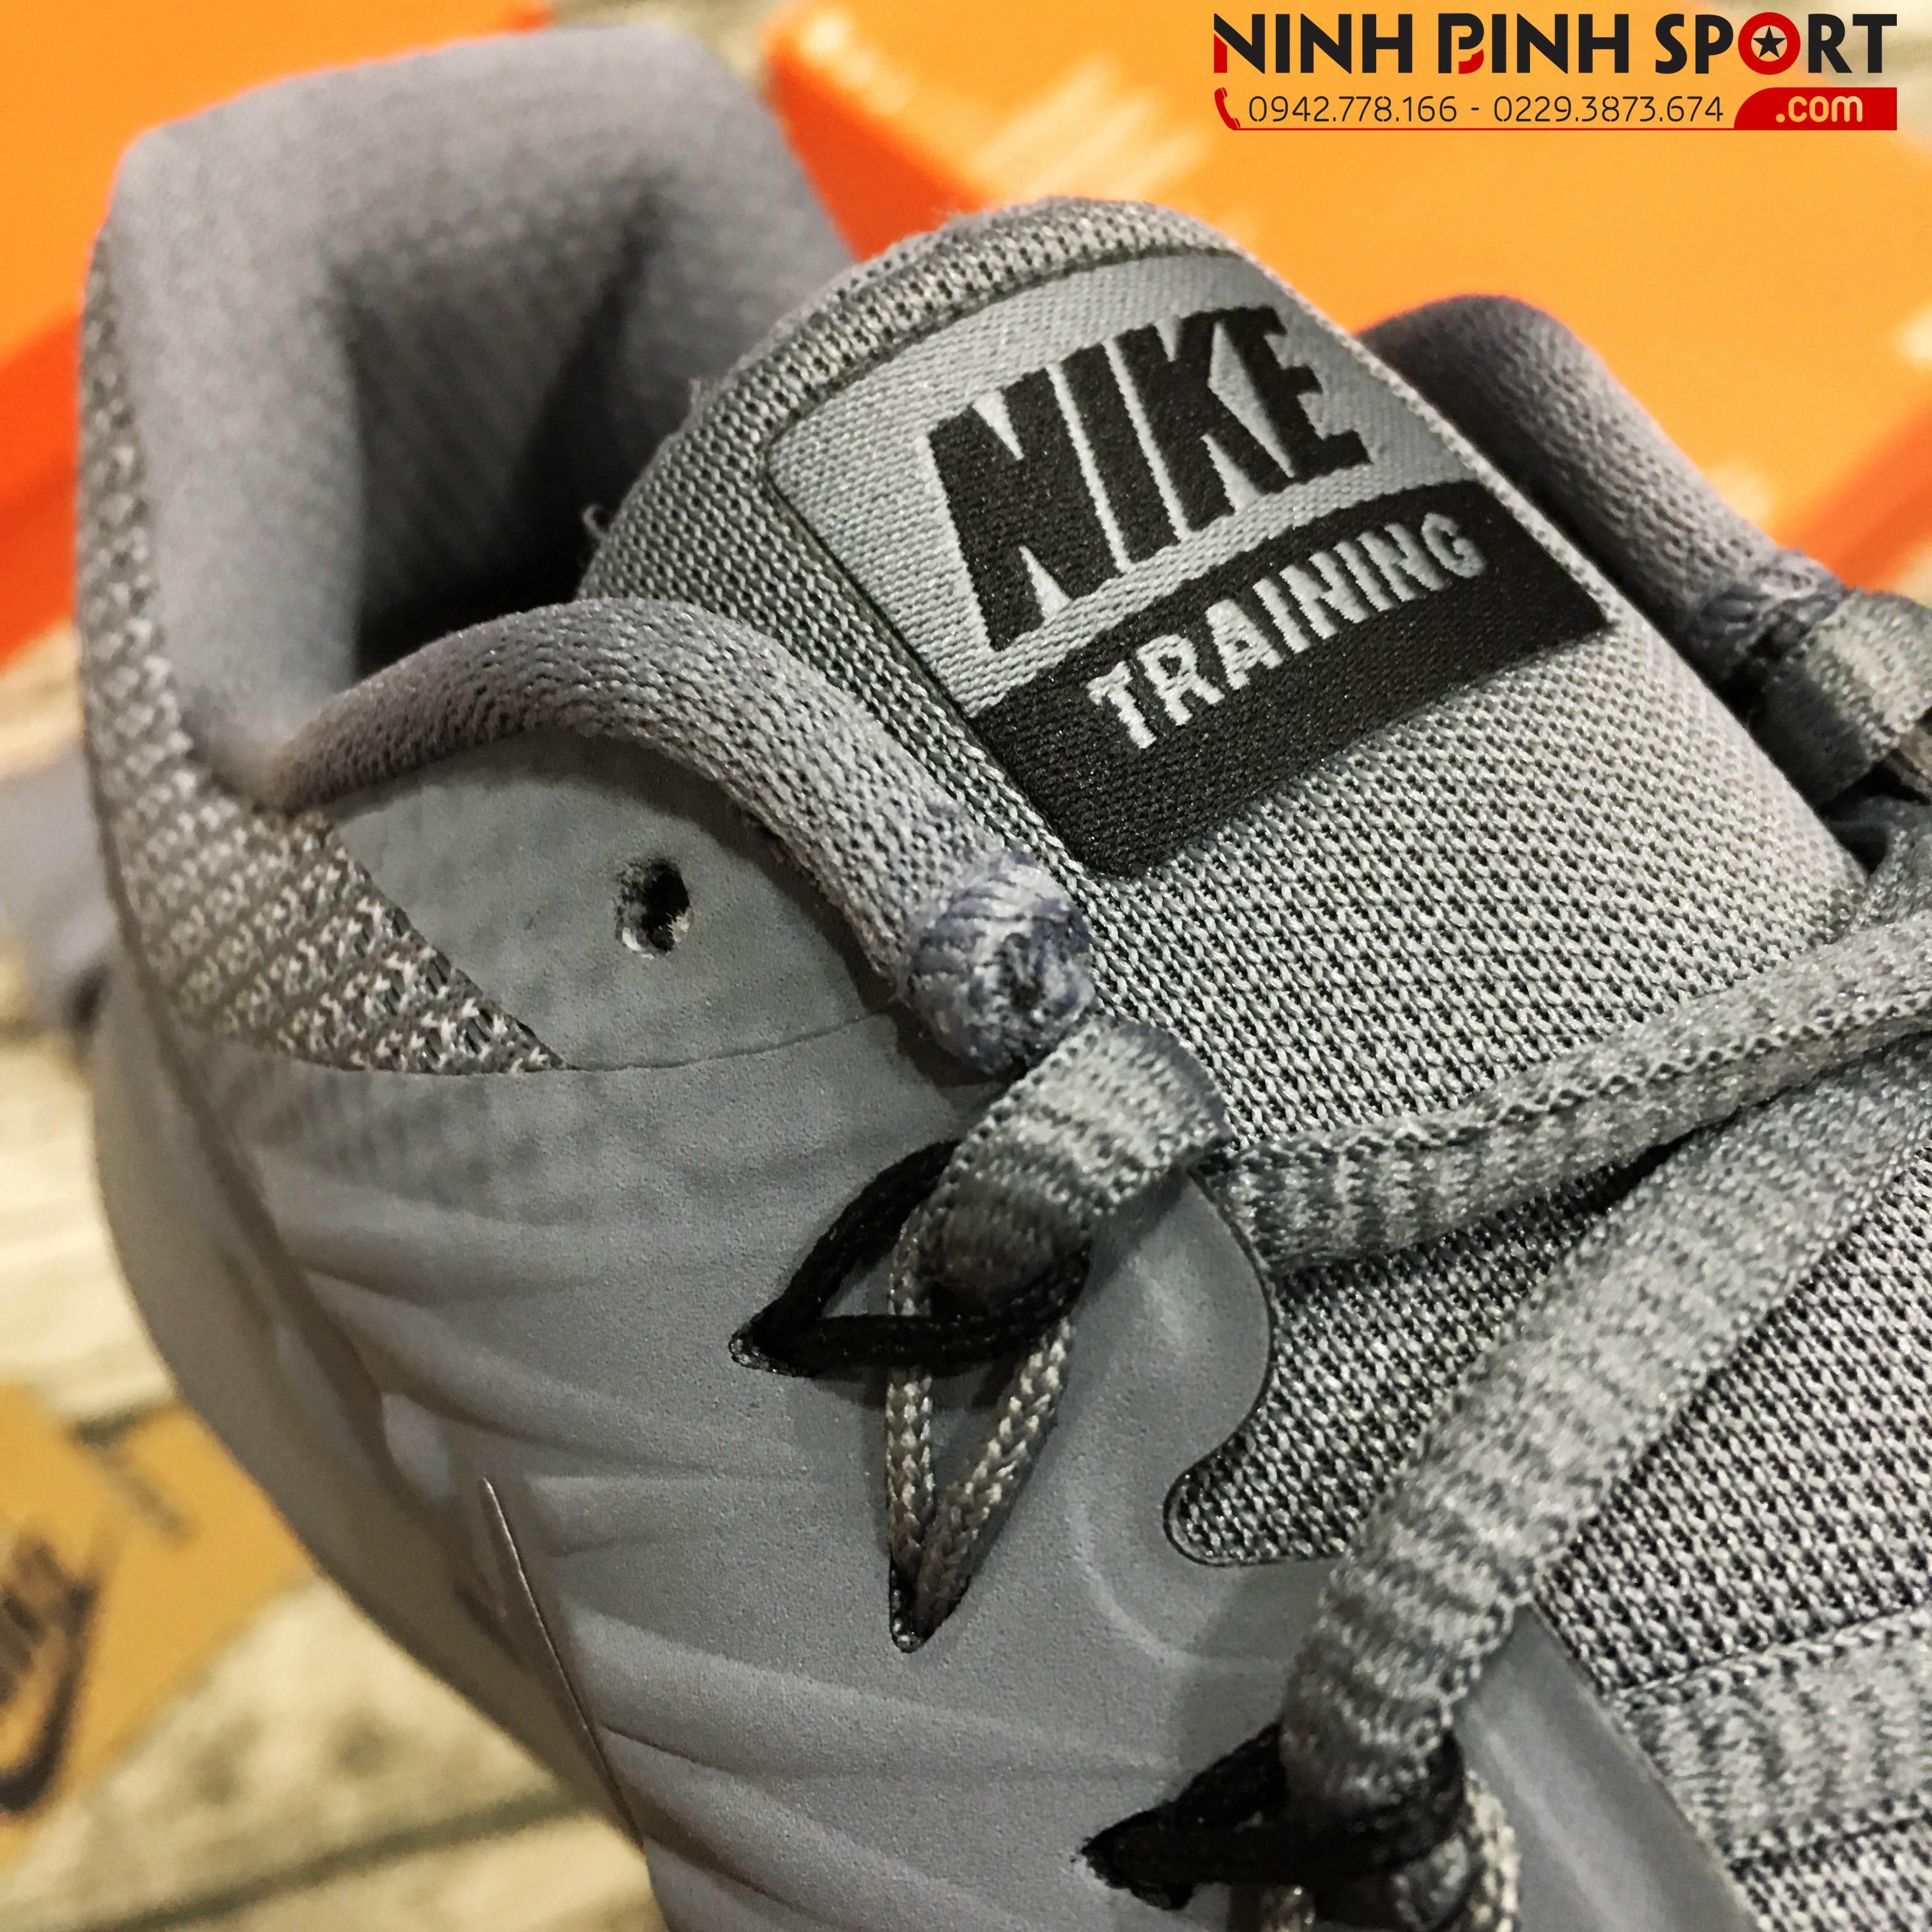 Giày thể thao nam Nike LUNAR PRIME IRON 908969-016